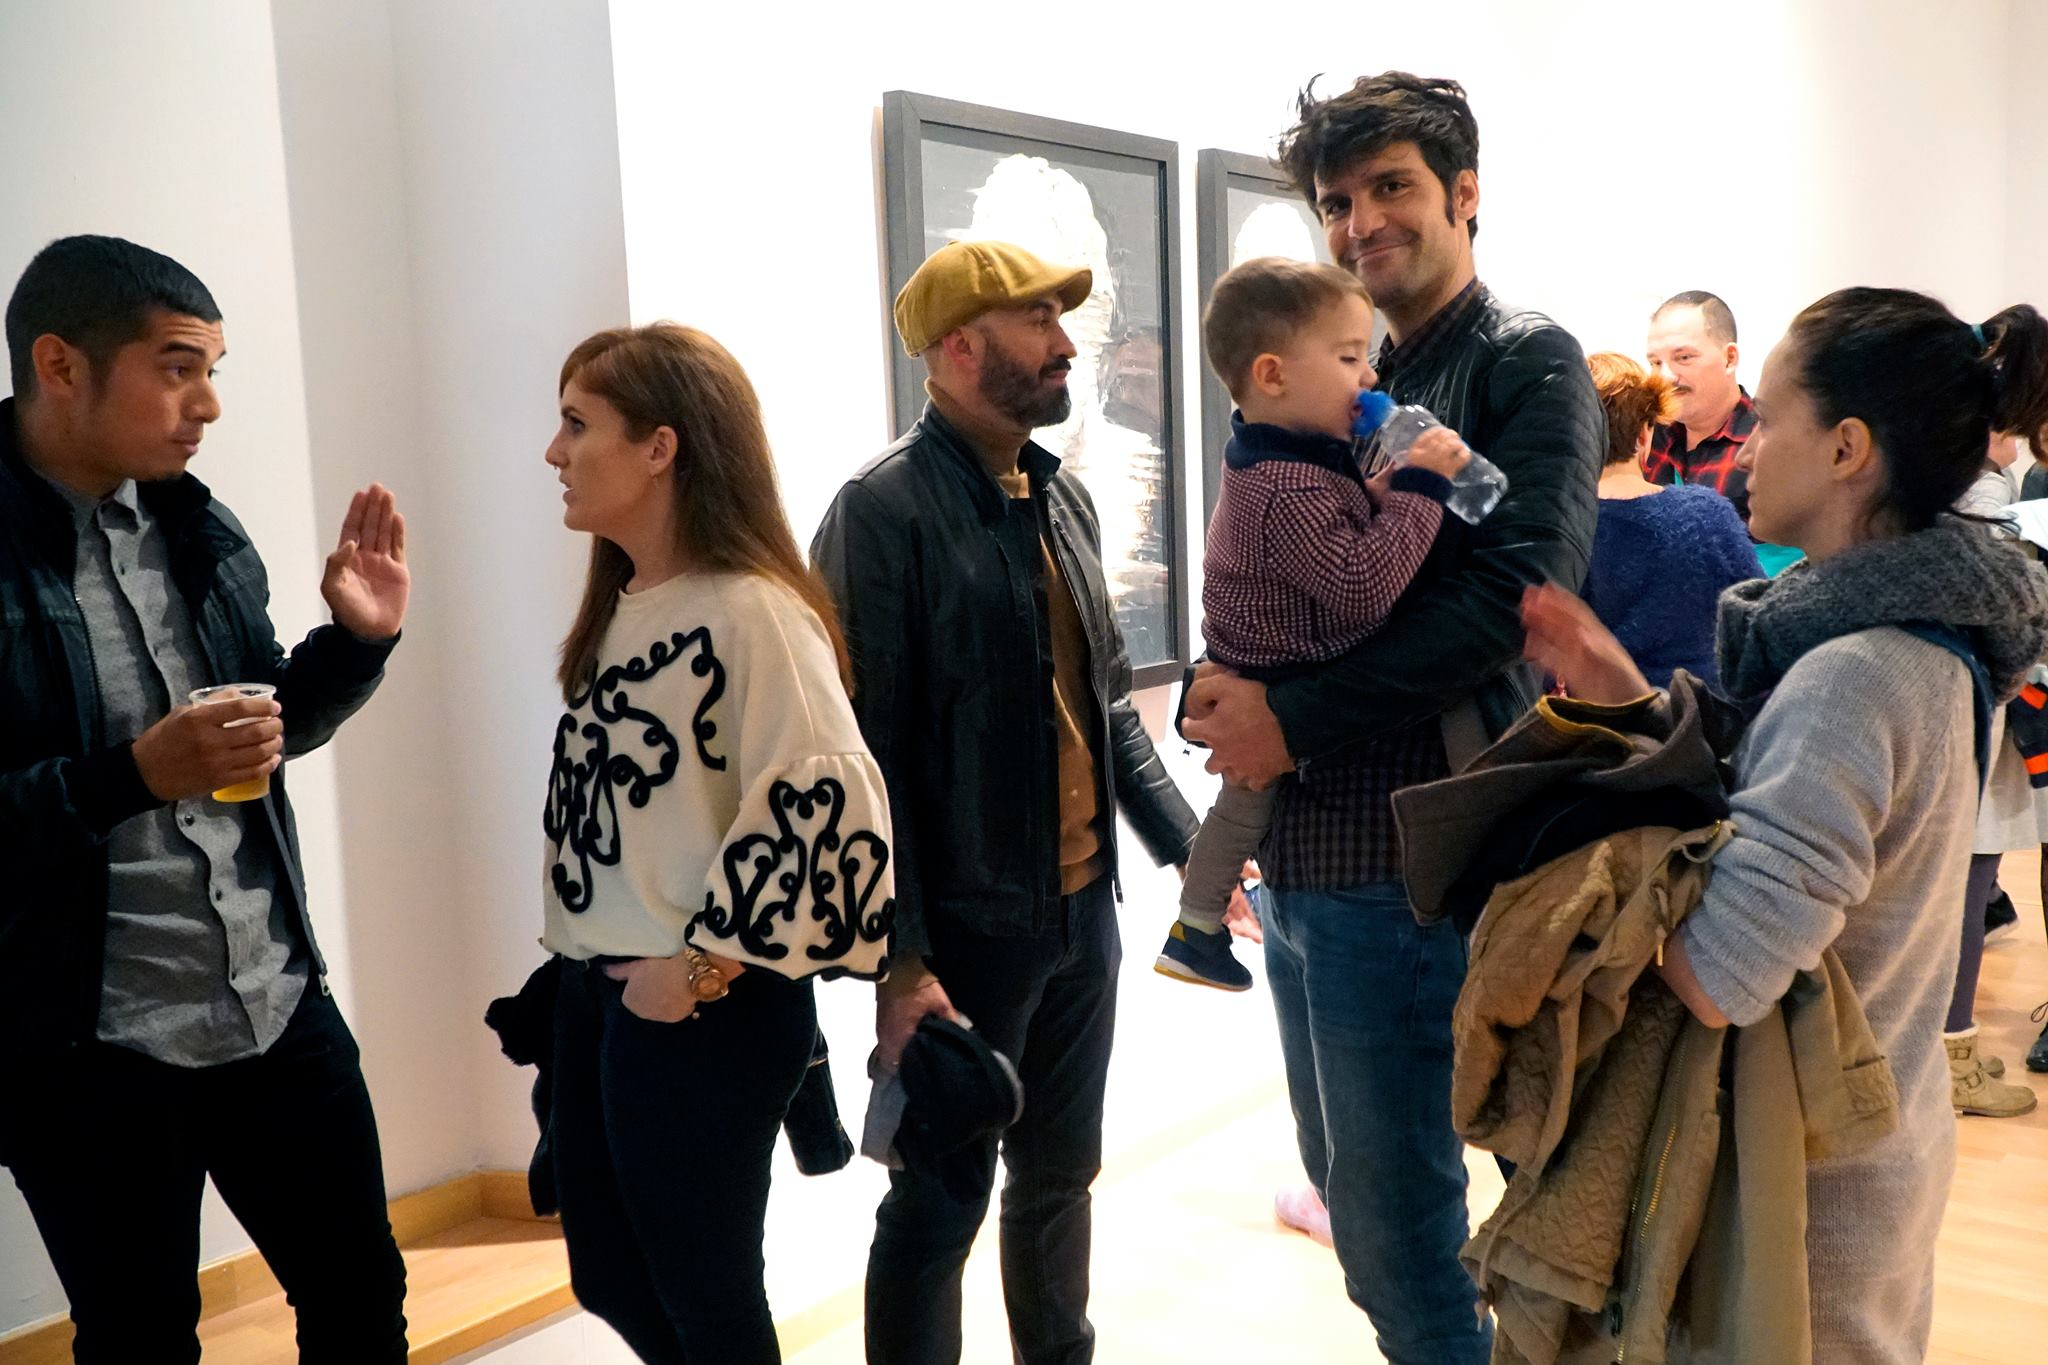 eldevenir-art-gallery-rafel-jimenez-jose-luis-puche-la-termica-malaga-2-s.jpg